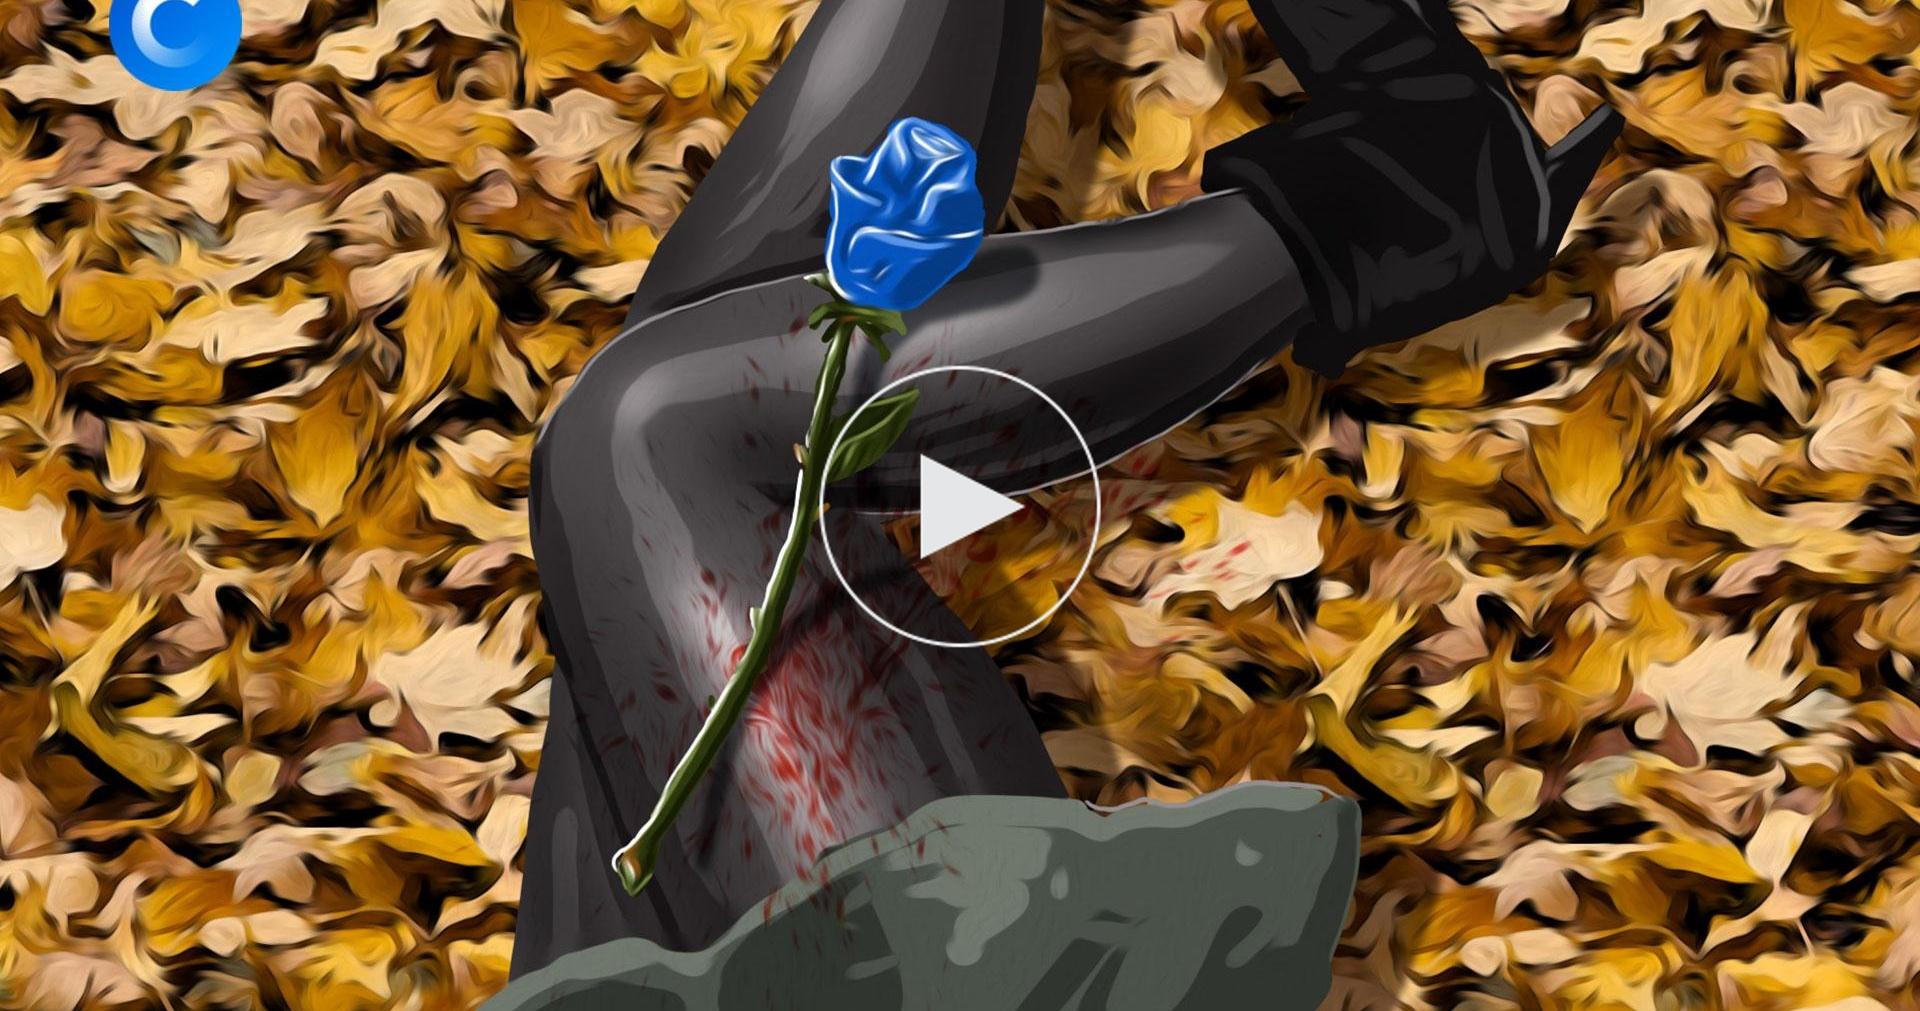 Синяя роза— эмблема убийства